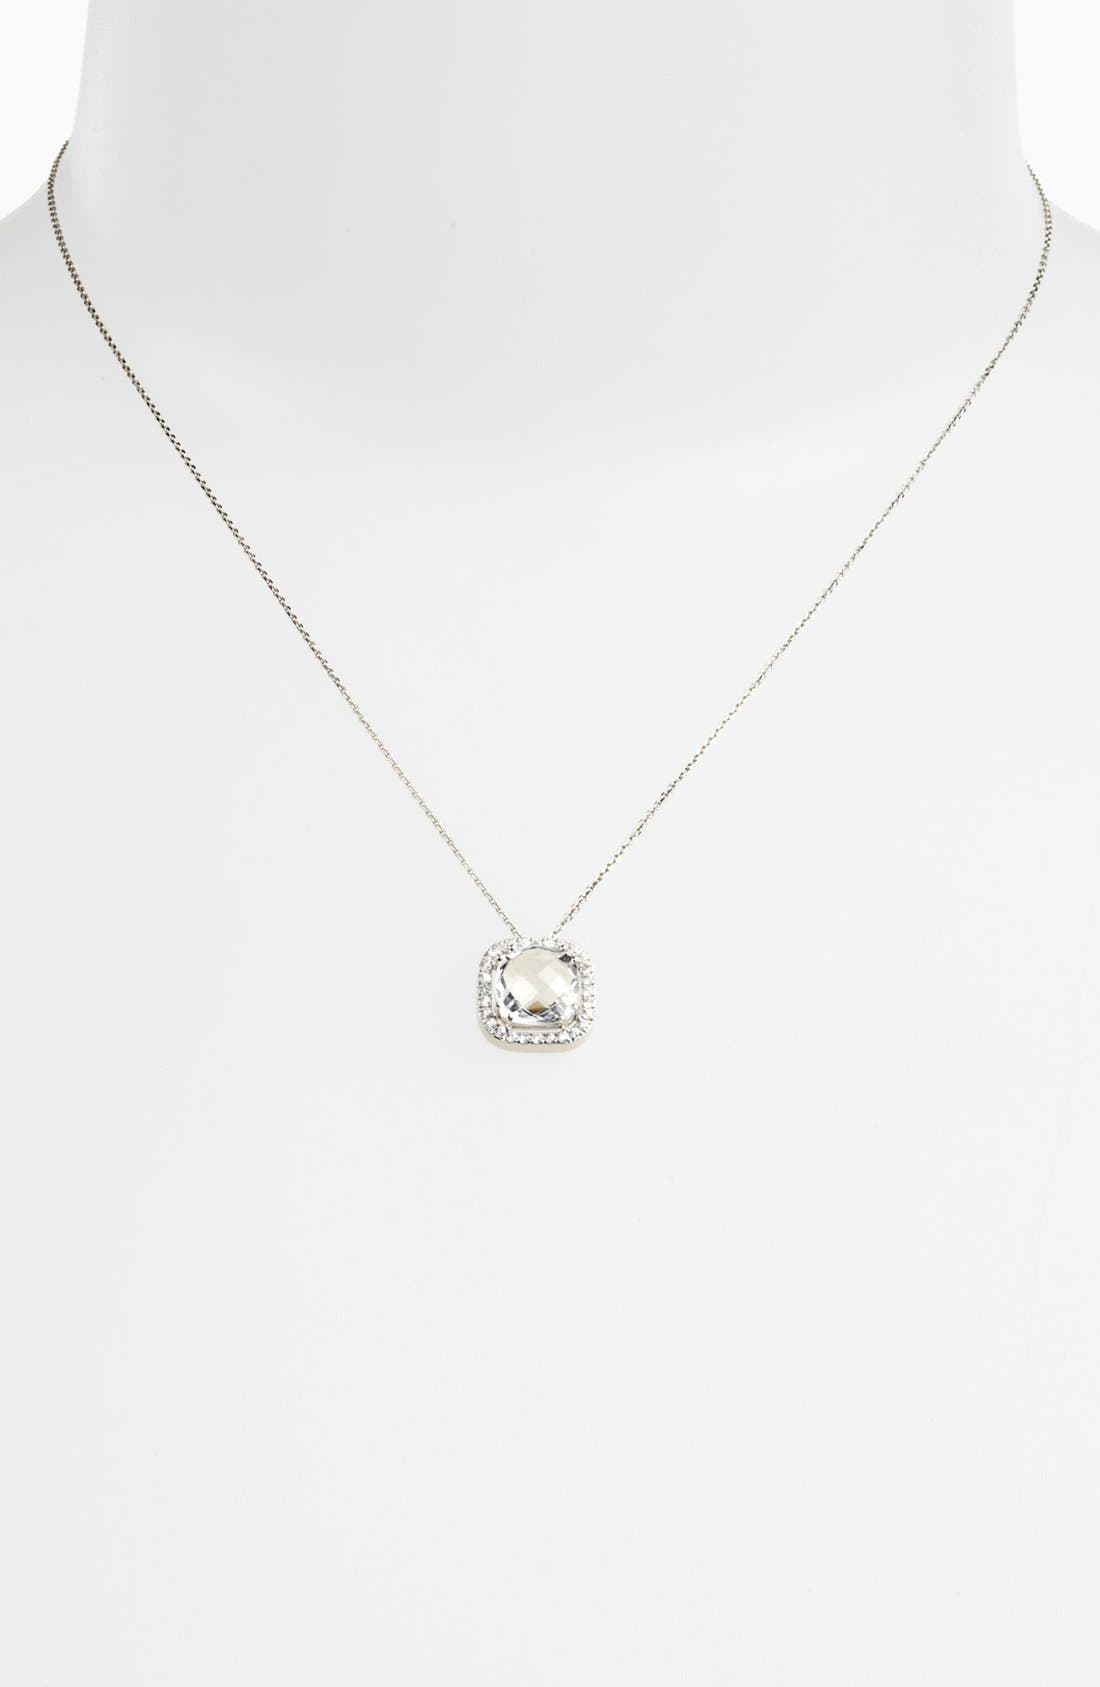 Alternate Image 1 Selected - KALAN by Suzanne Kalan Sapphire Bezel Pendant Necklace